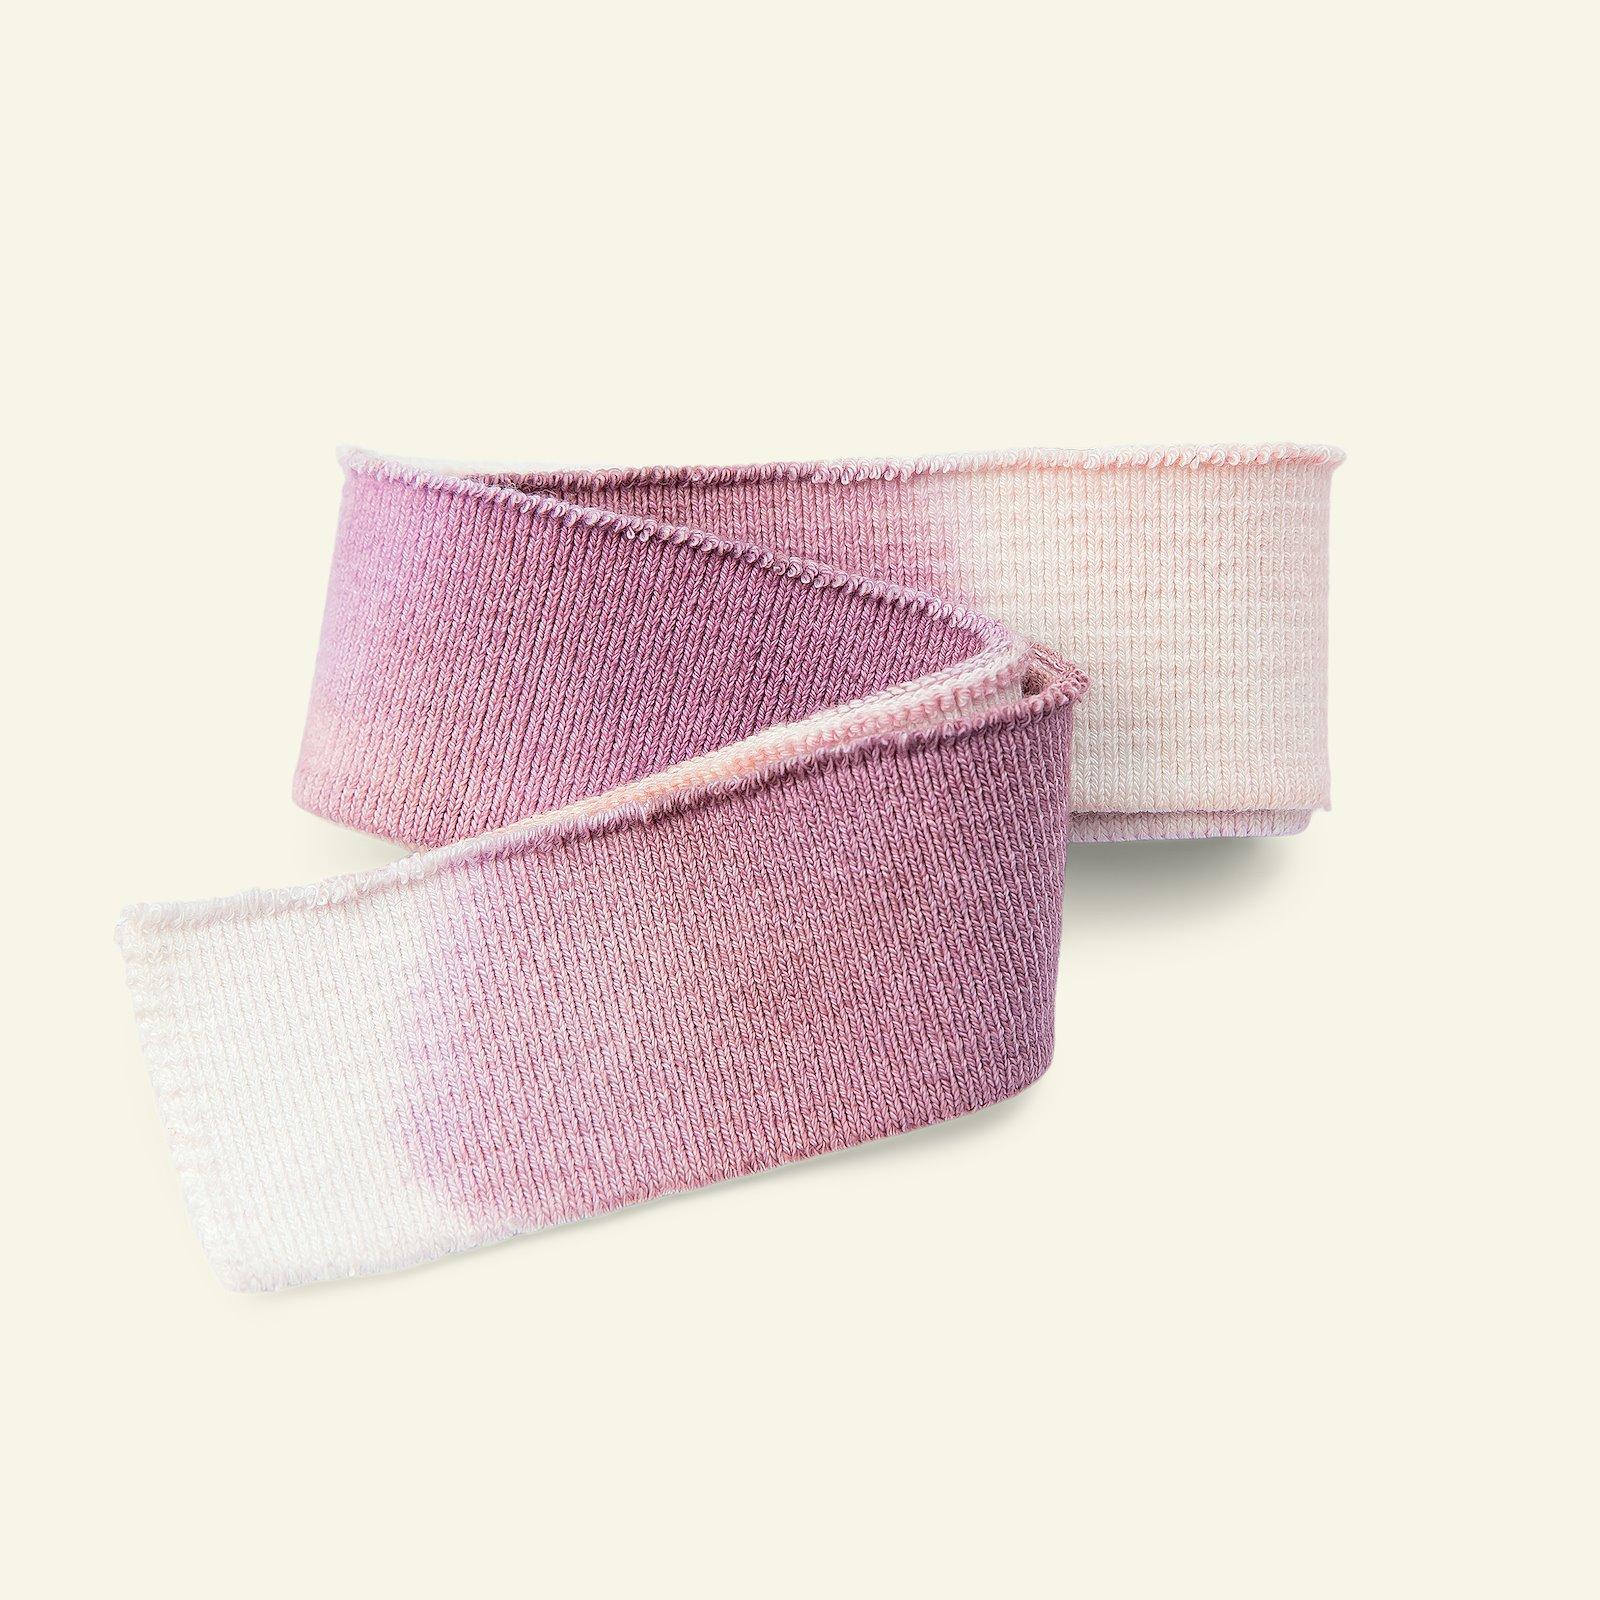 Rib 3,5x100cm purple multi 1pc 22254_pack